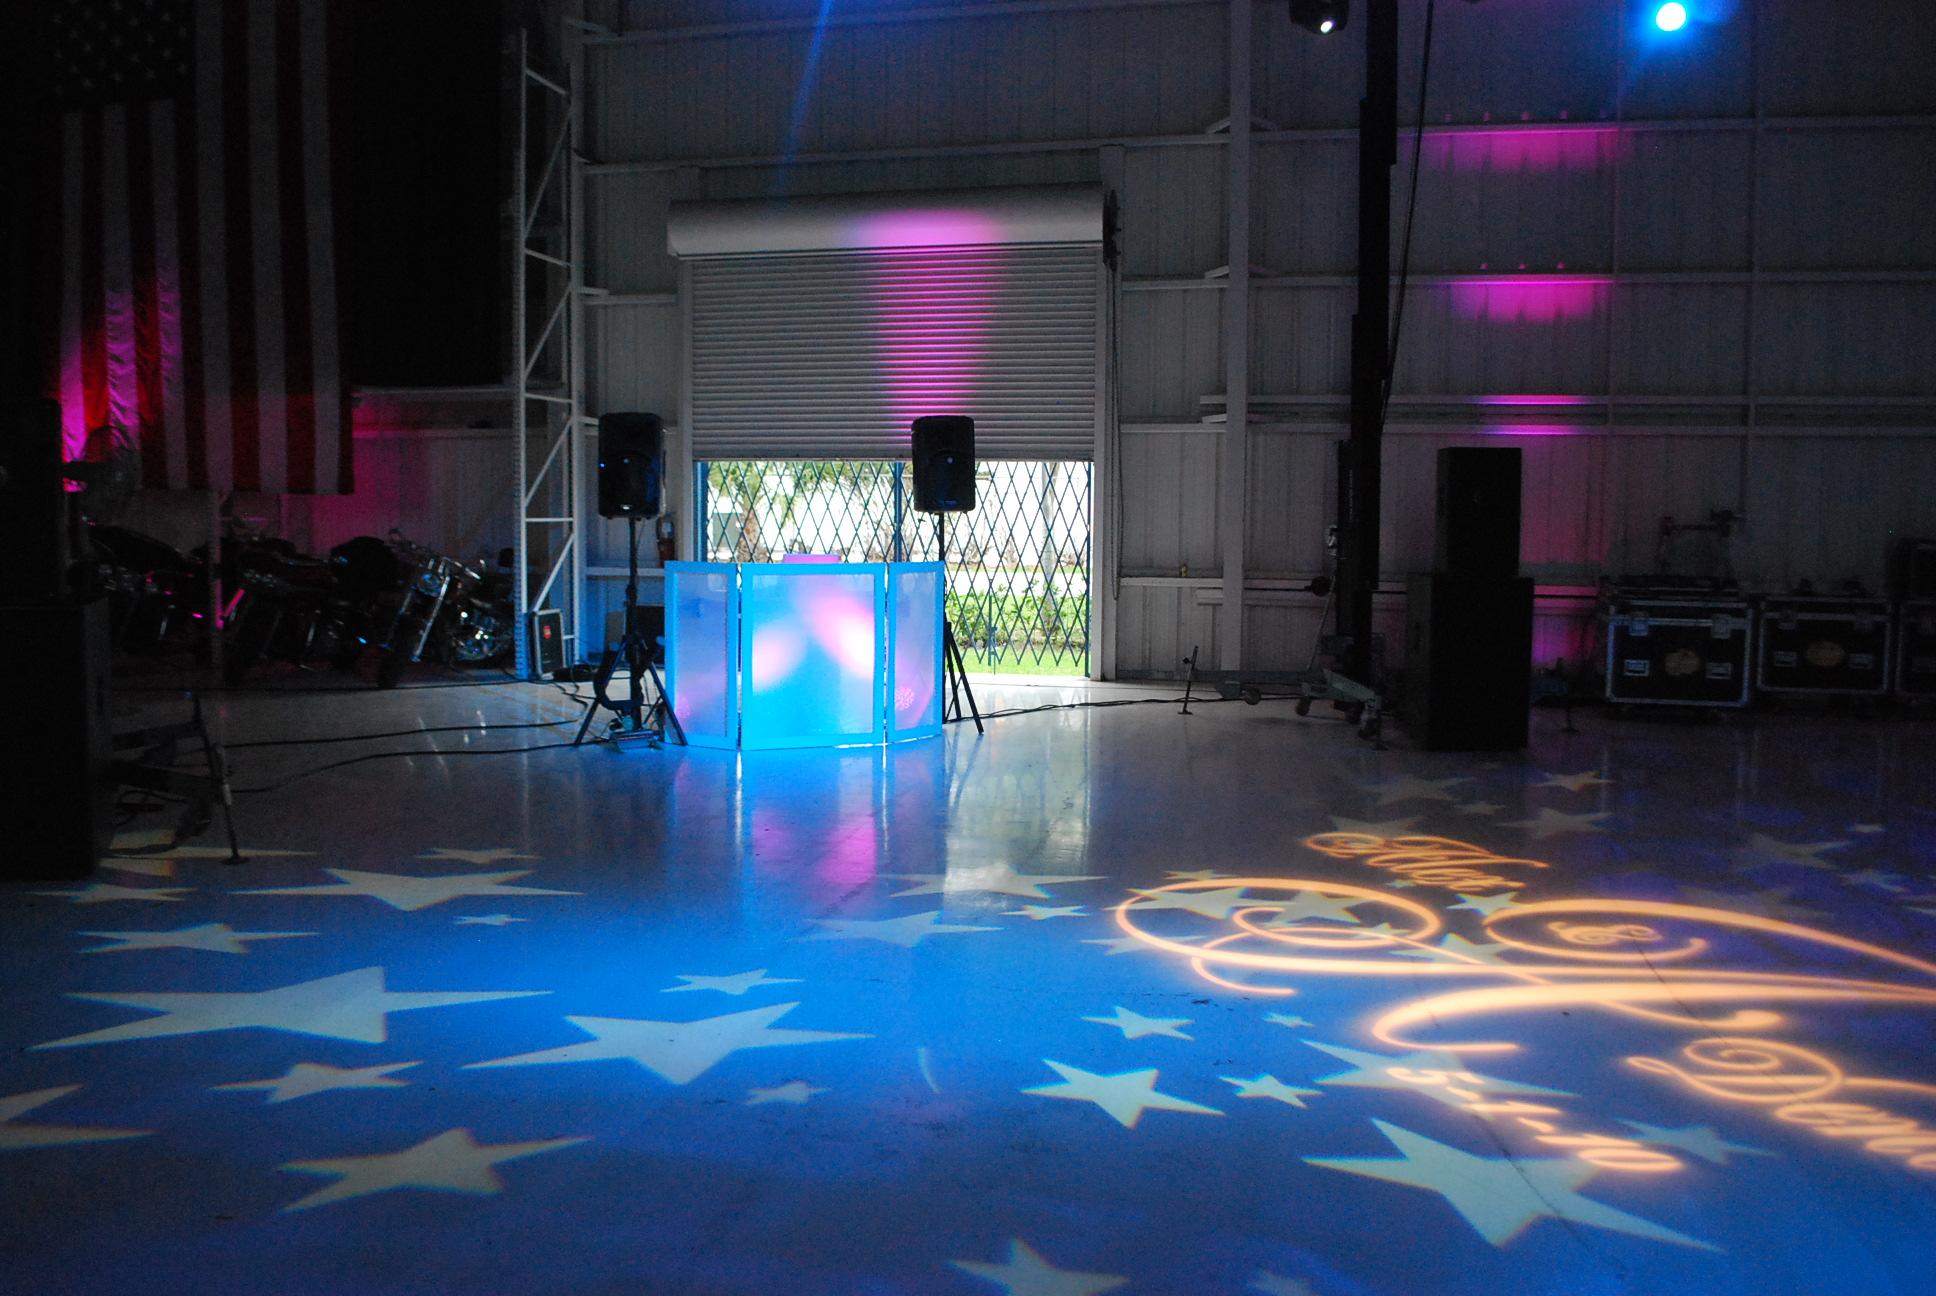 Wedding Dancefloor, Miami Dj, Wedding, Stages, Wedding Stage, Miami Wedding Djs, Gobos, Up Lighting